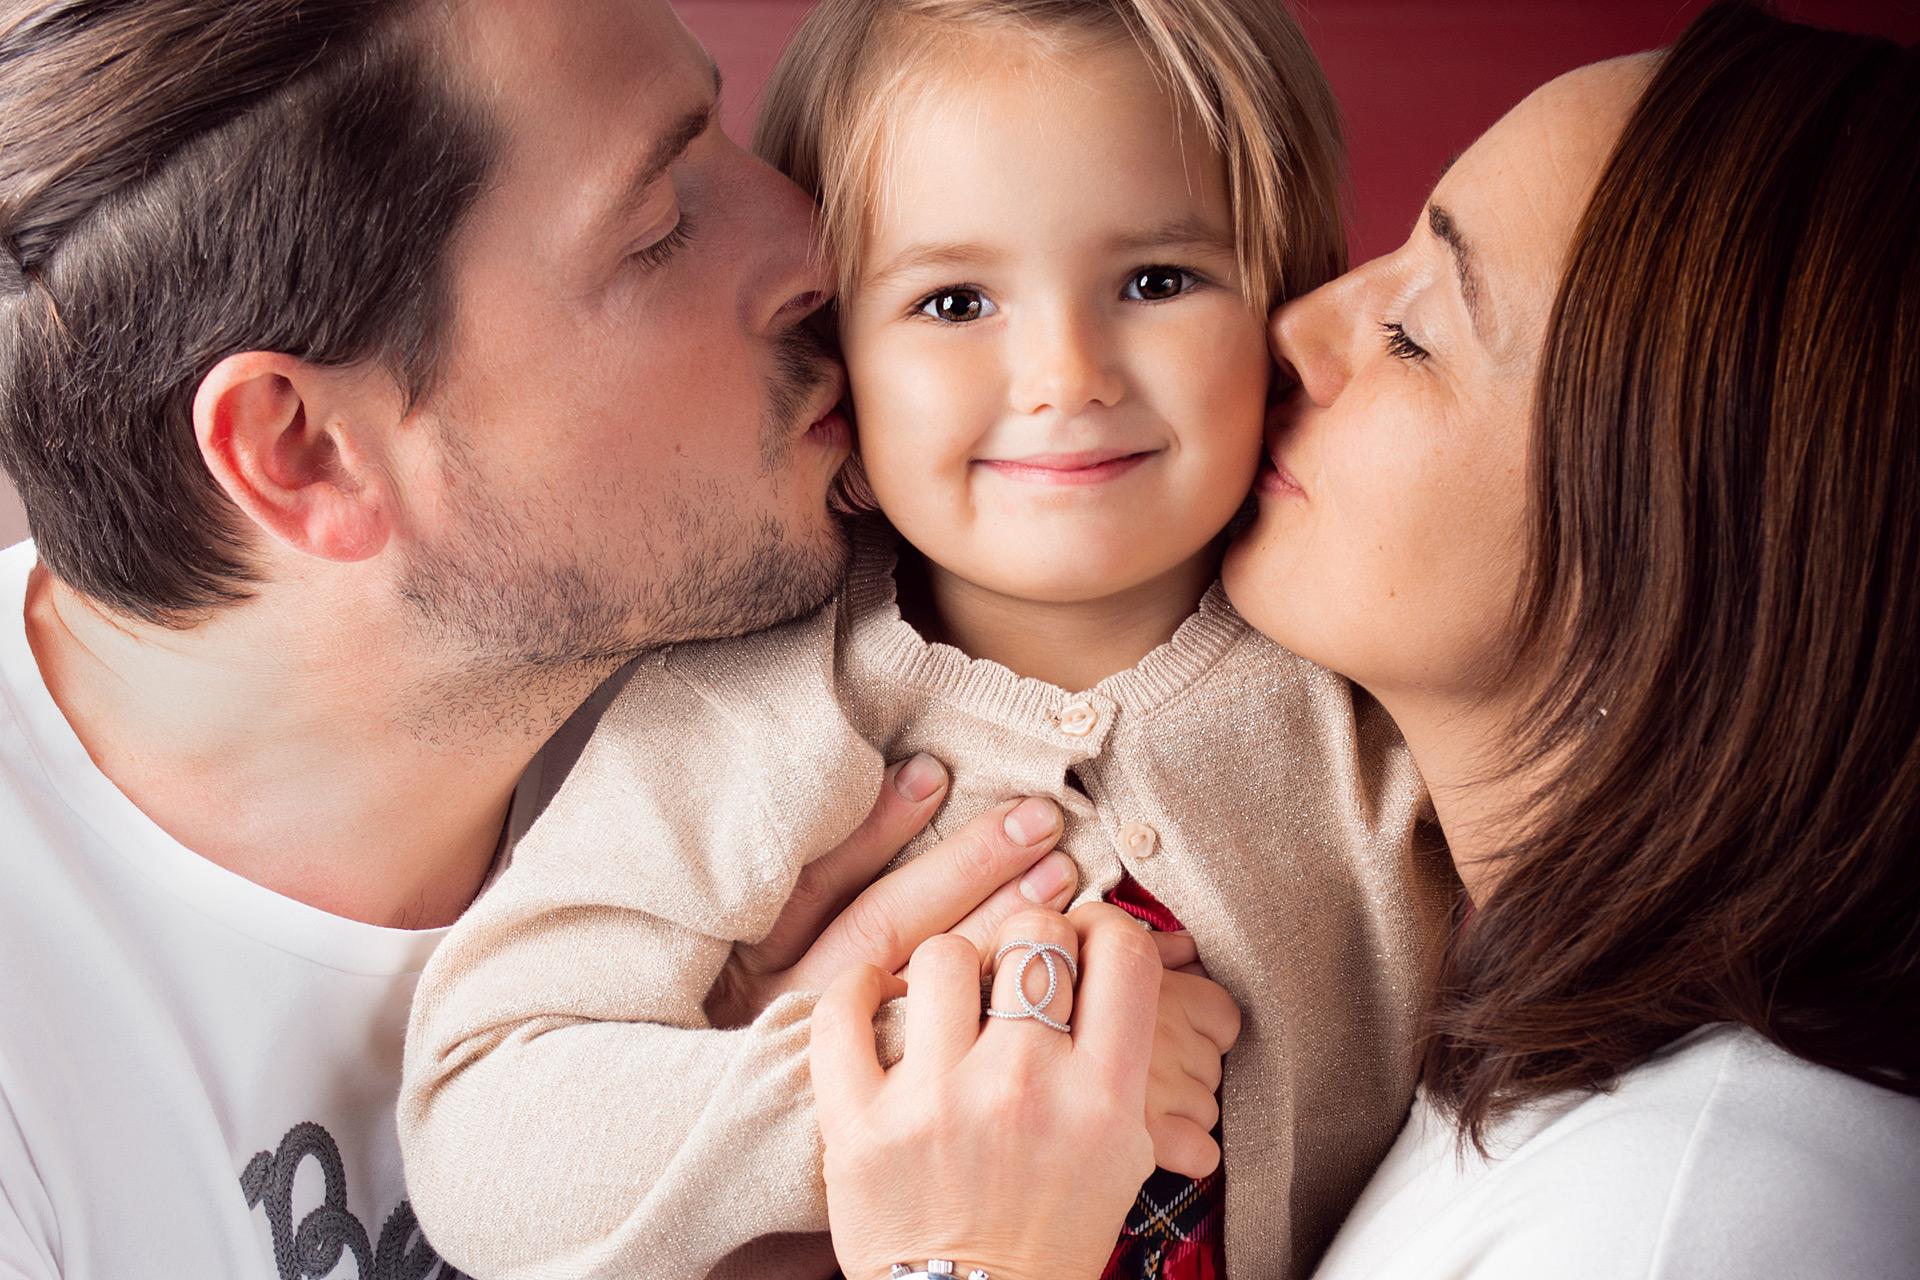 FamilienfotoFotografJuliaJungbeckseibildschoen - PORTFOLIO